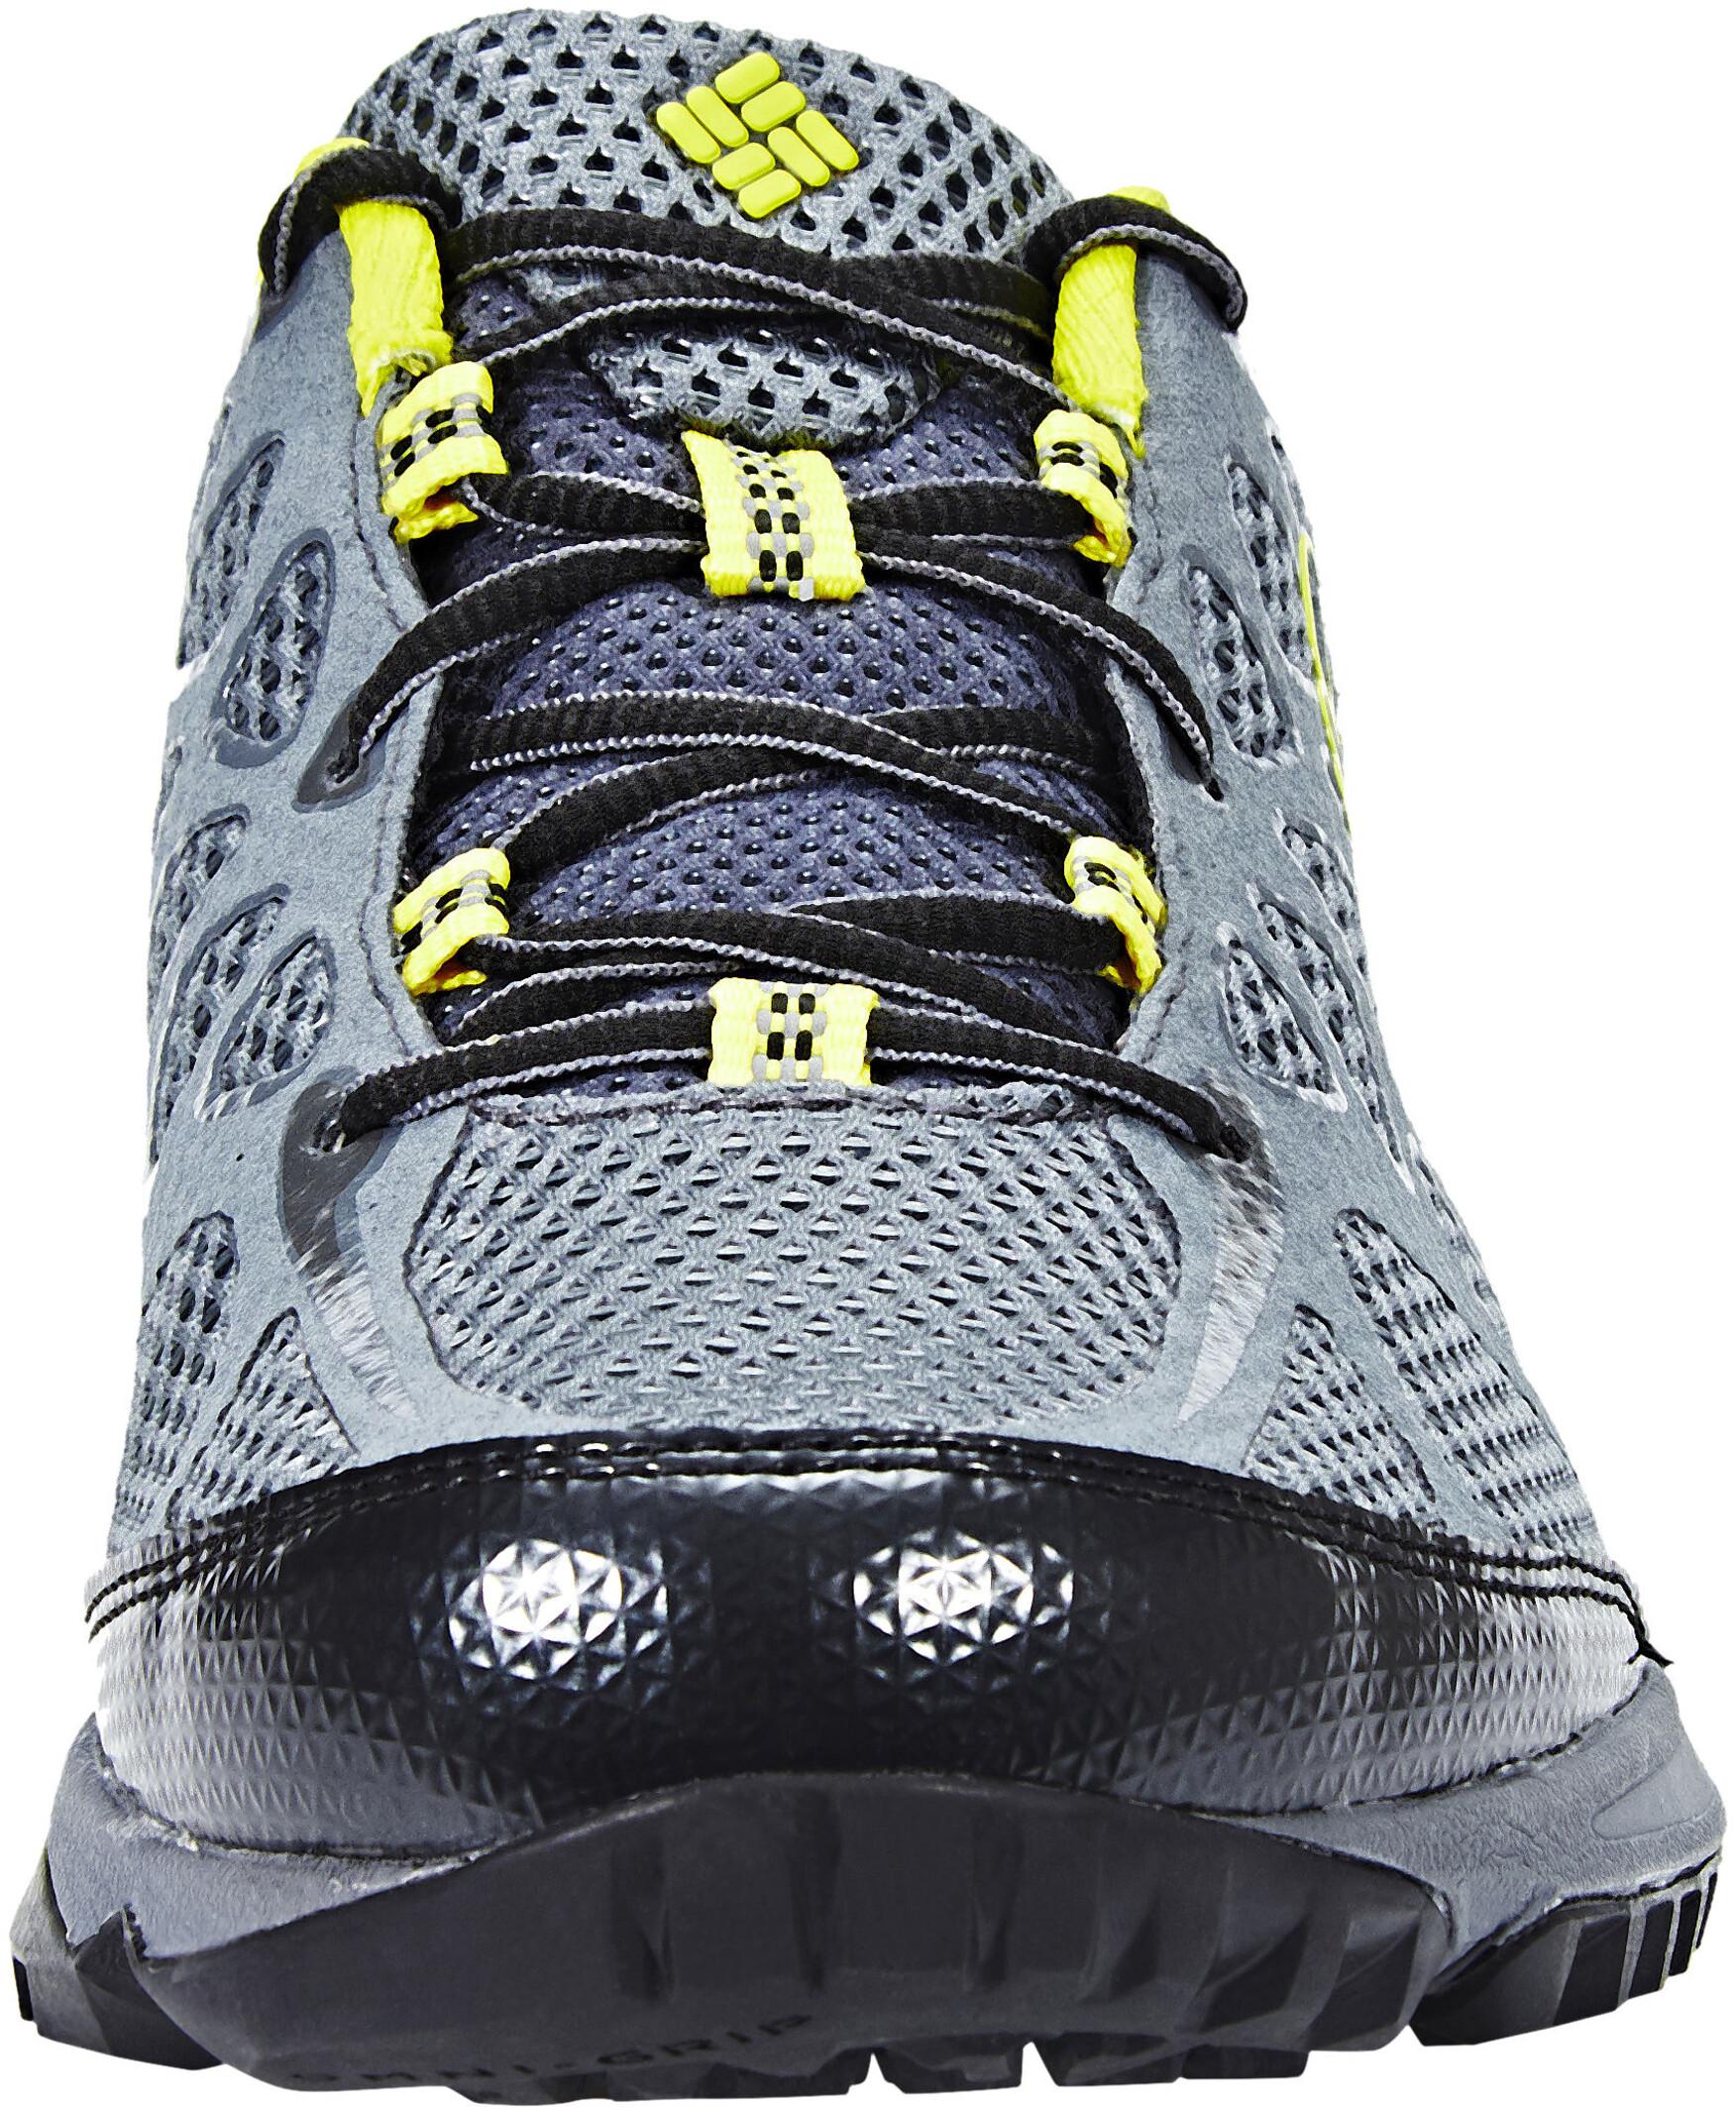 8b5b802b599c9 Columbia Conspiracy Titanium Outdry Shoes Men grey at Addnature.co.uk